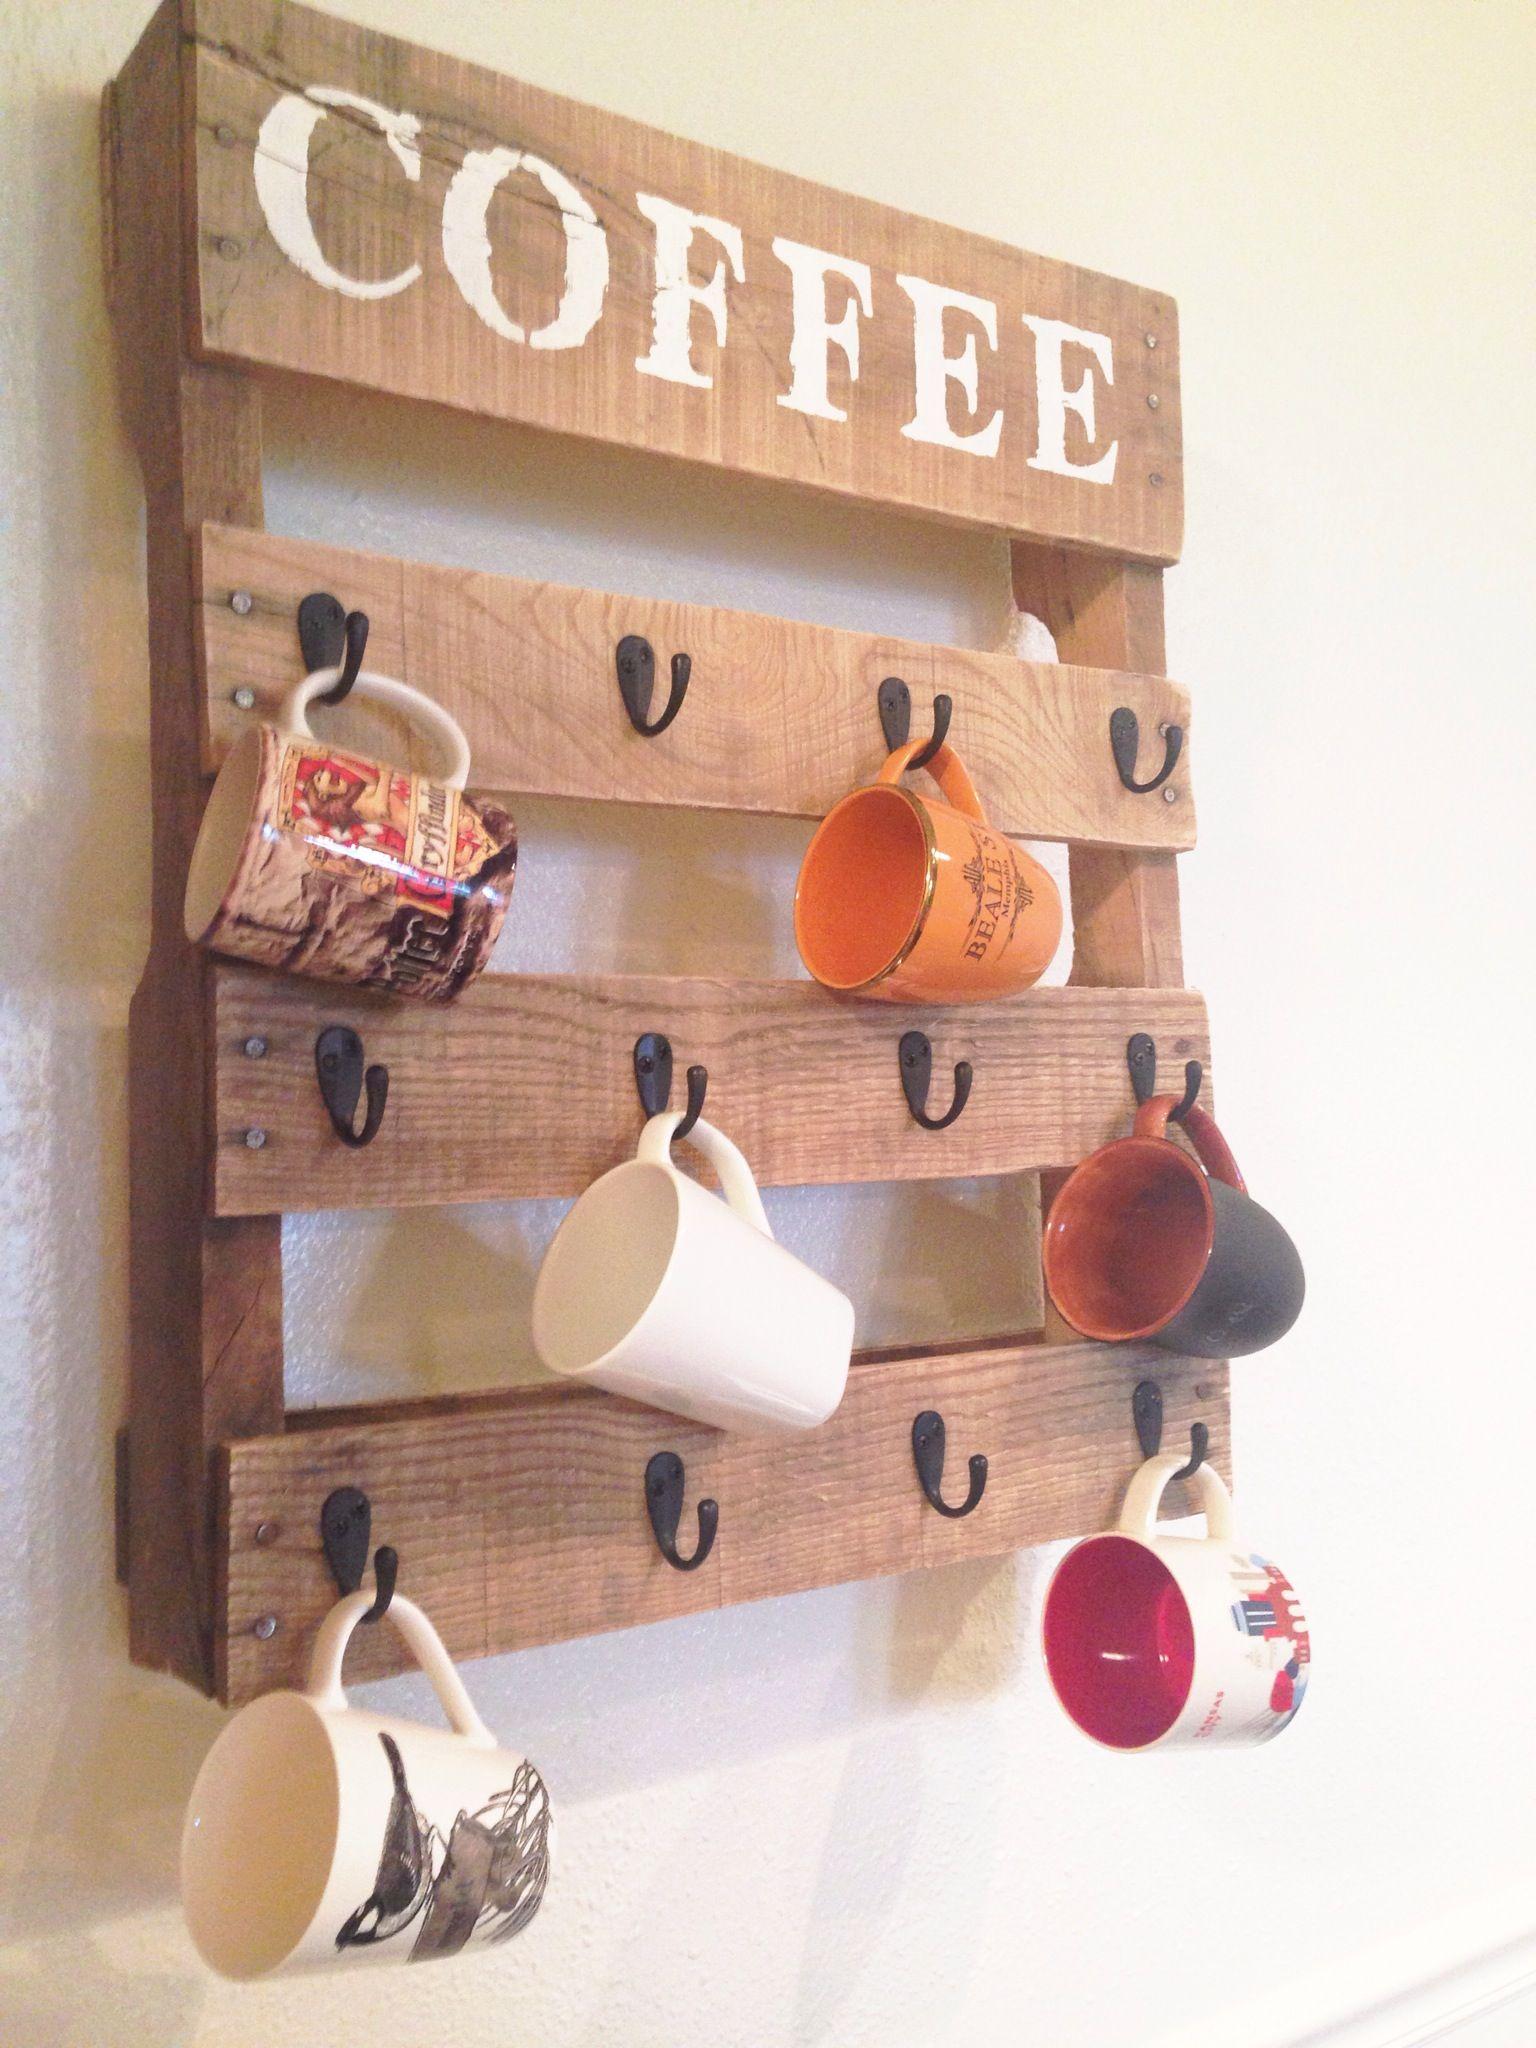 DIY Pallet Coffee Cup Holder